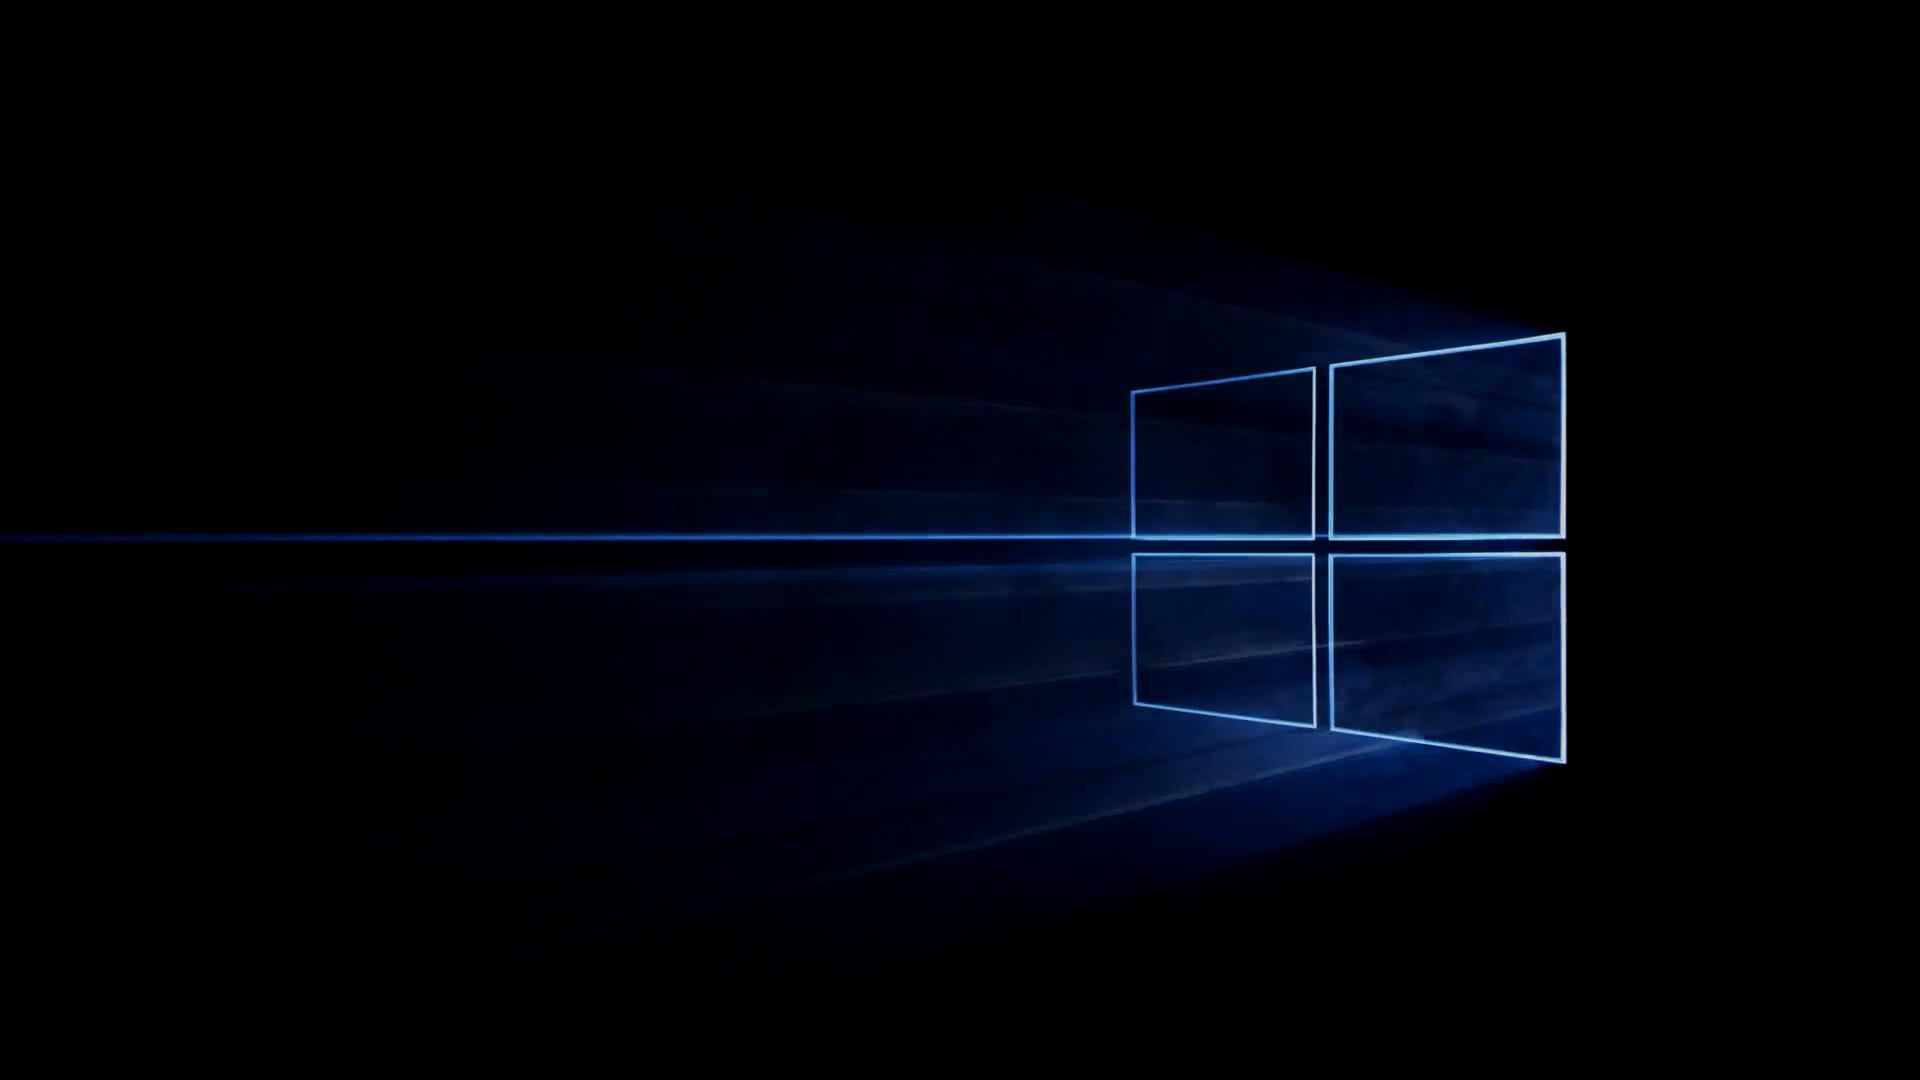 Windows 10 Wallpaper 4k-4